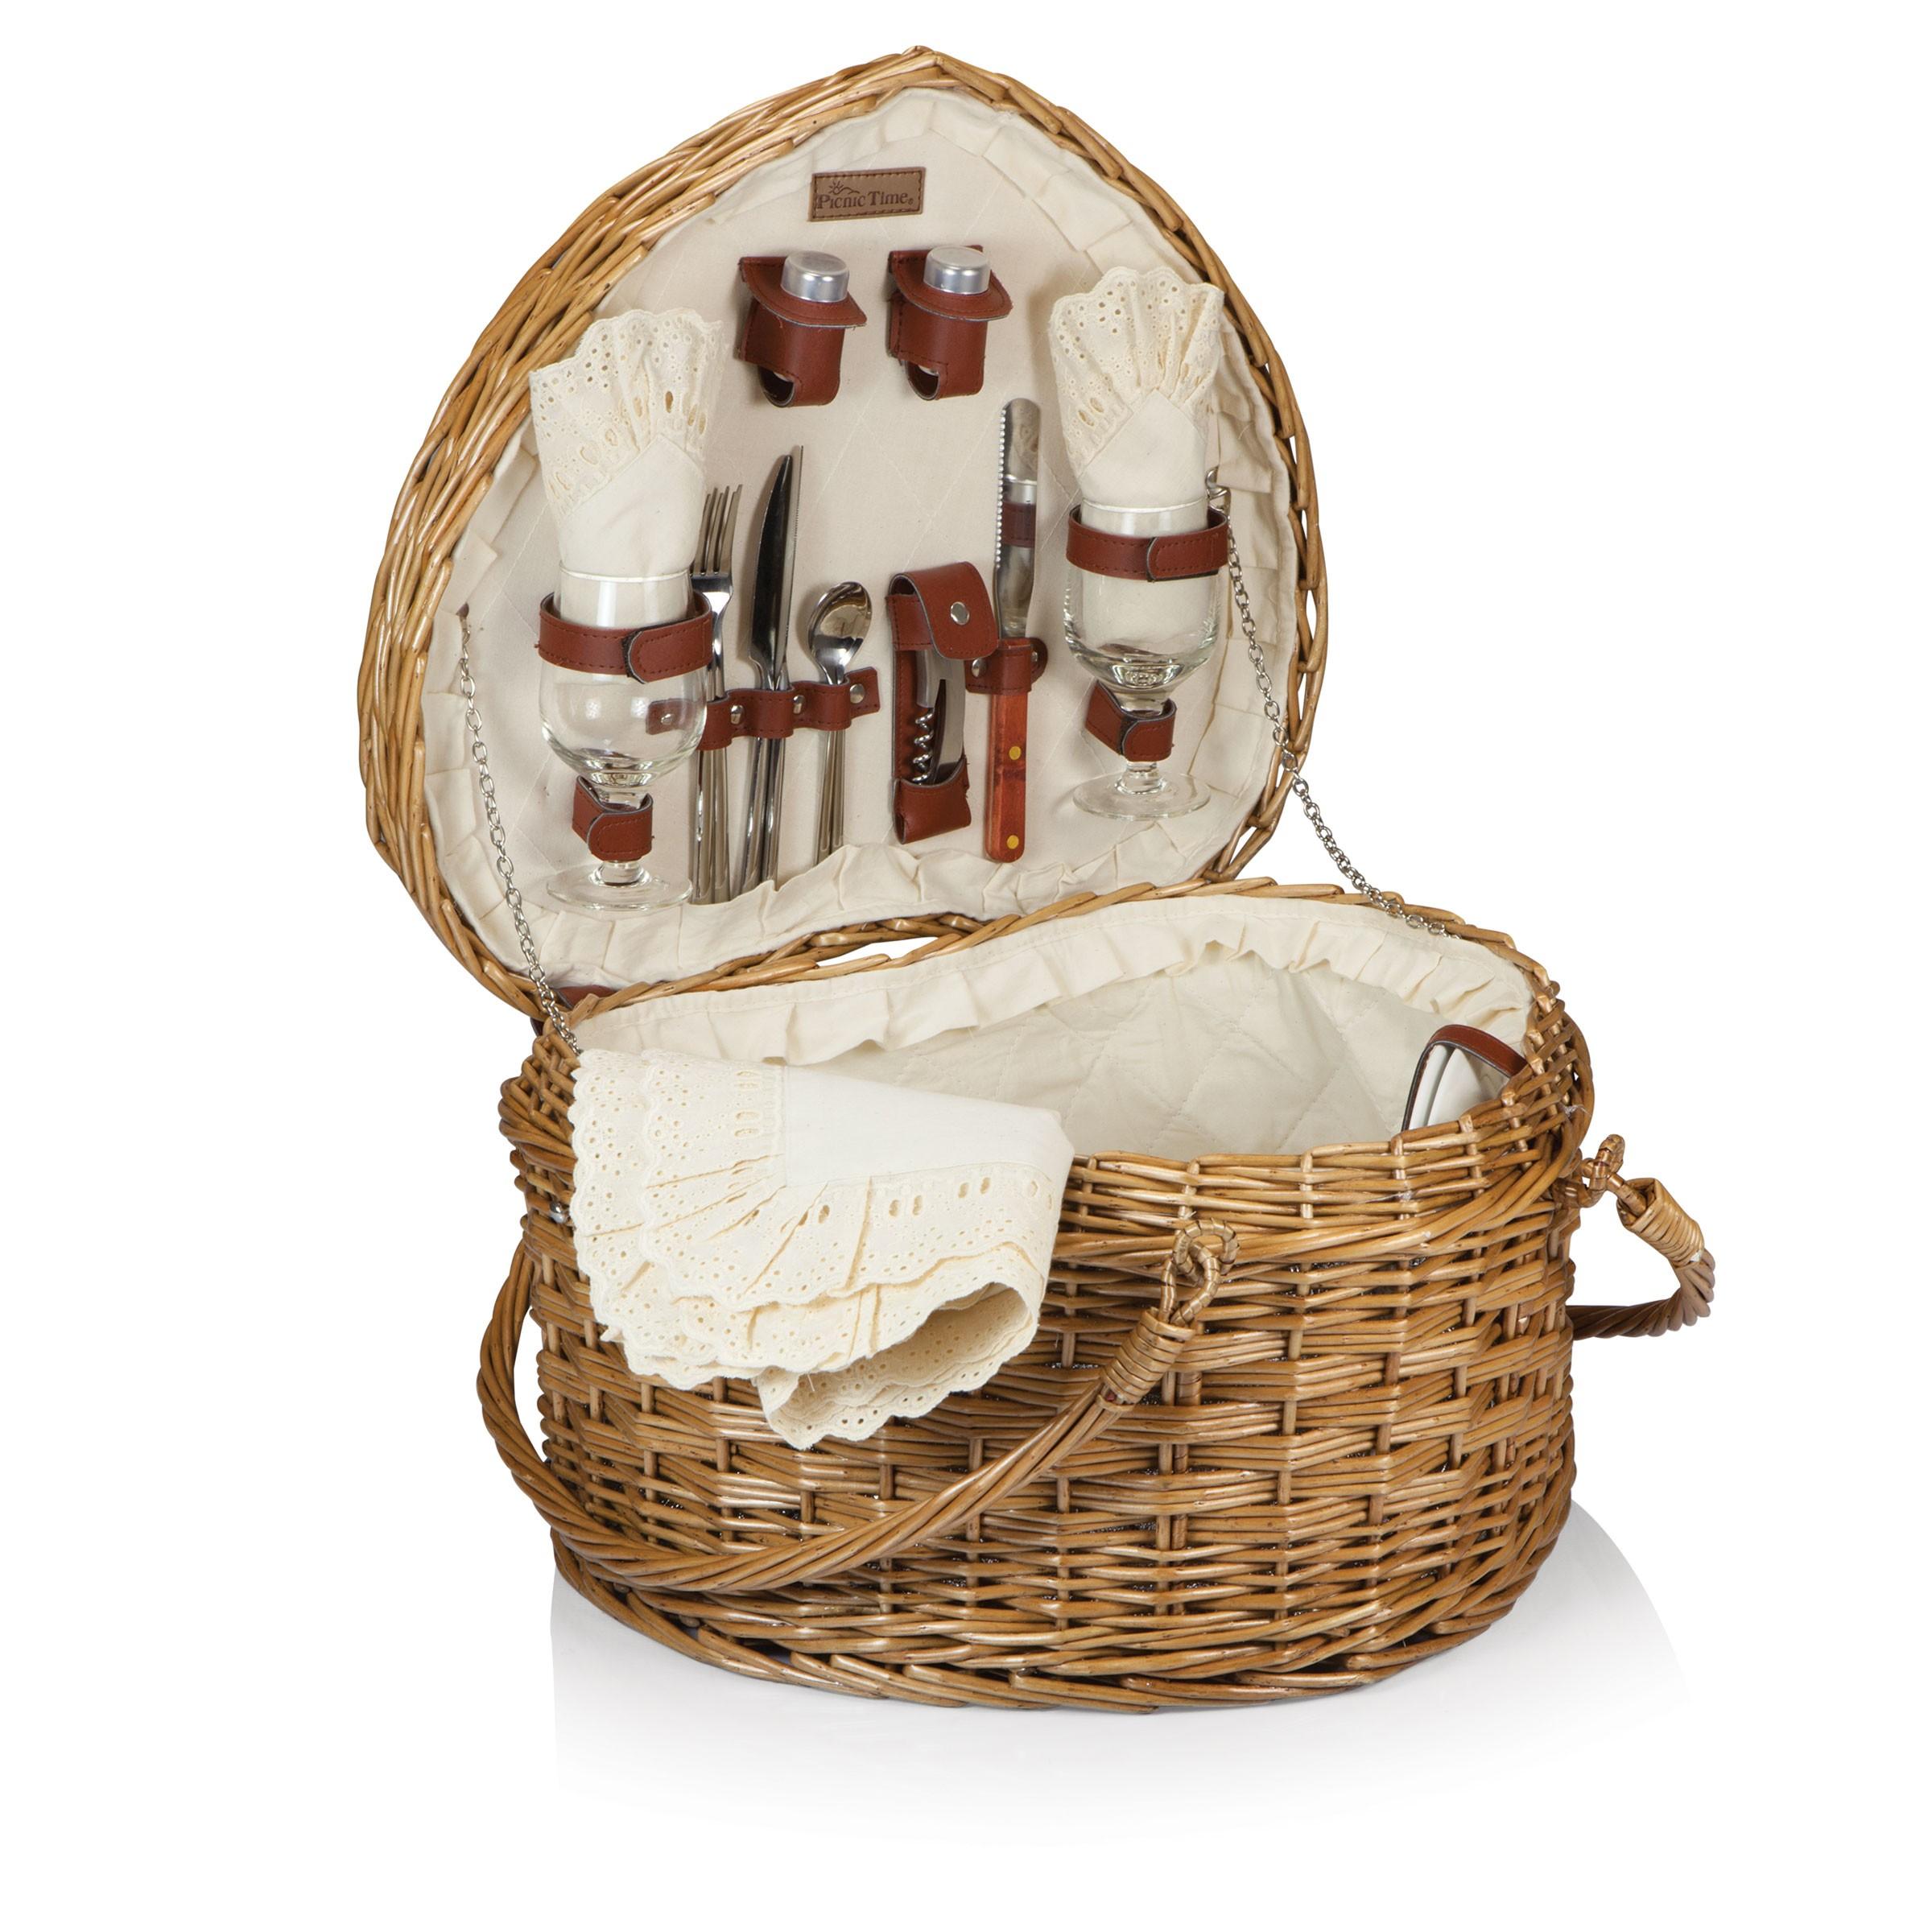 Heart Picnic Basket   Picnic Baskets   Wedding   Anniversary   gift